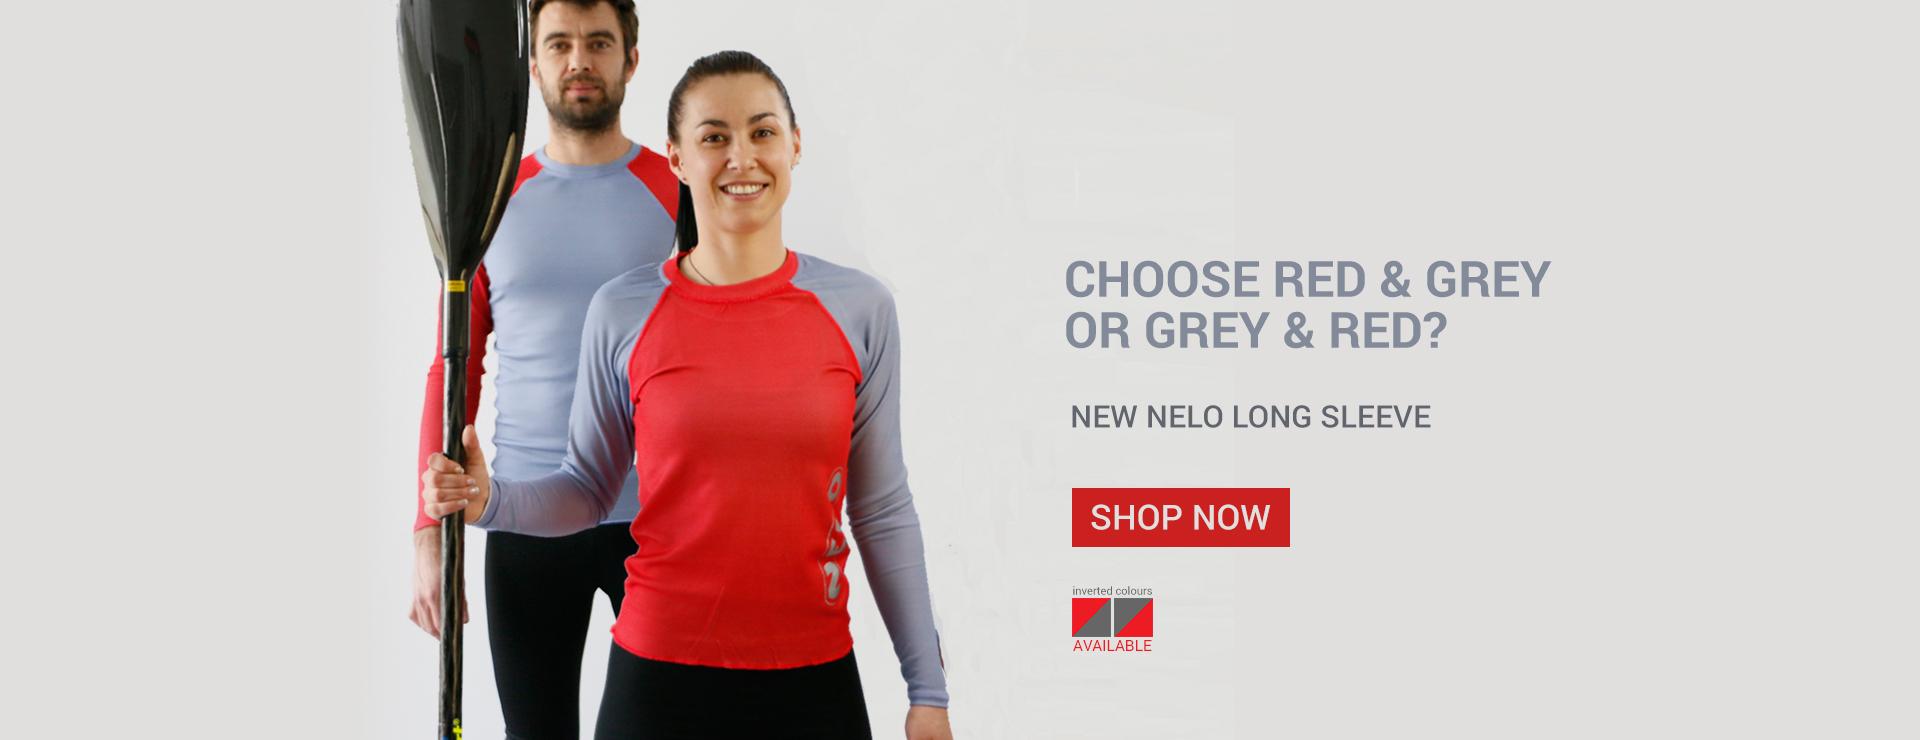 New Nelo Long Sleeve Red & Grey